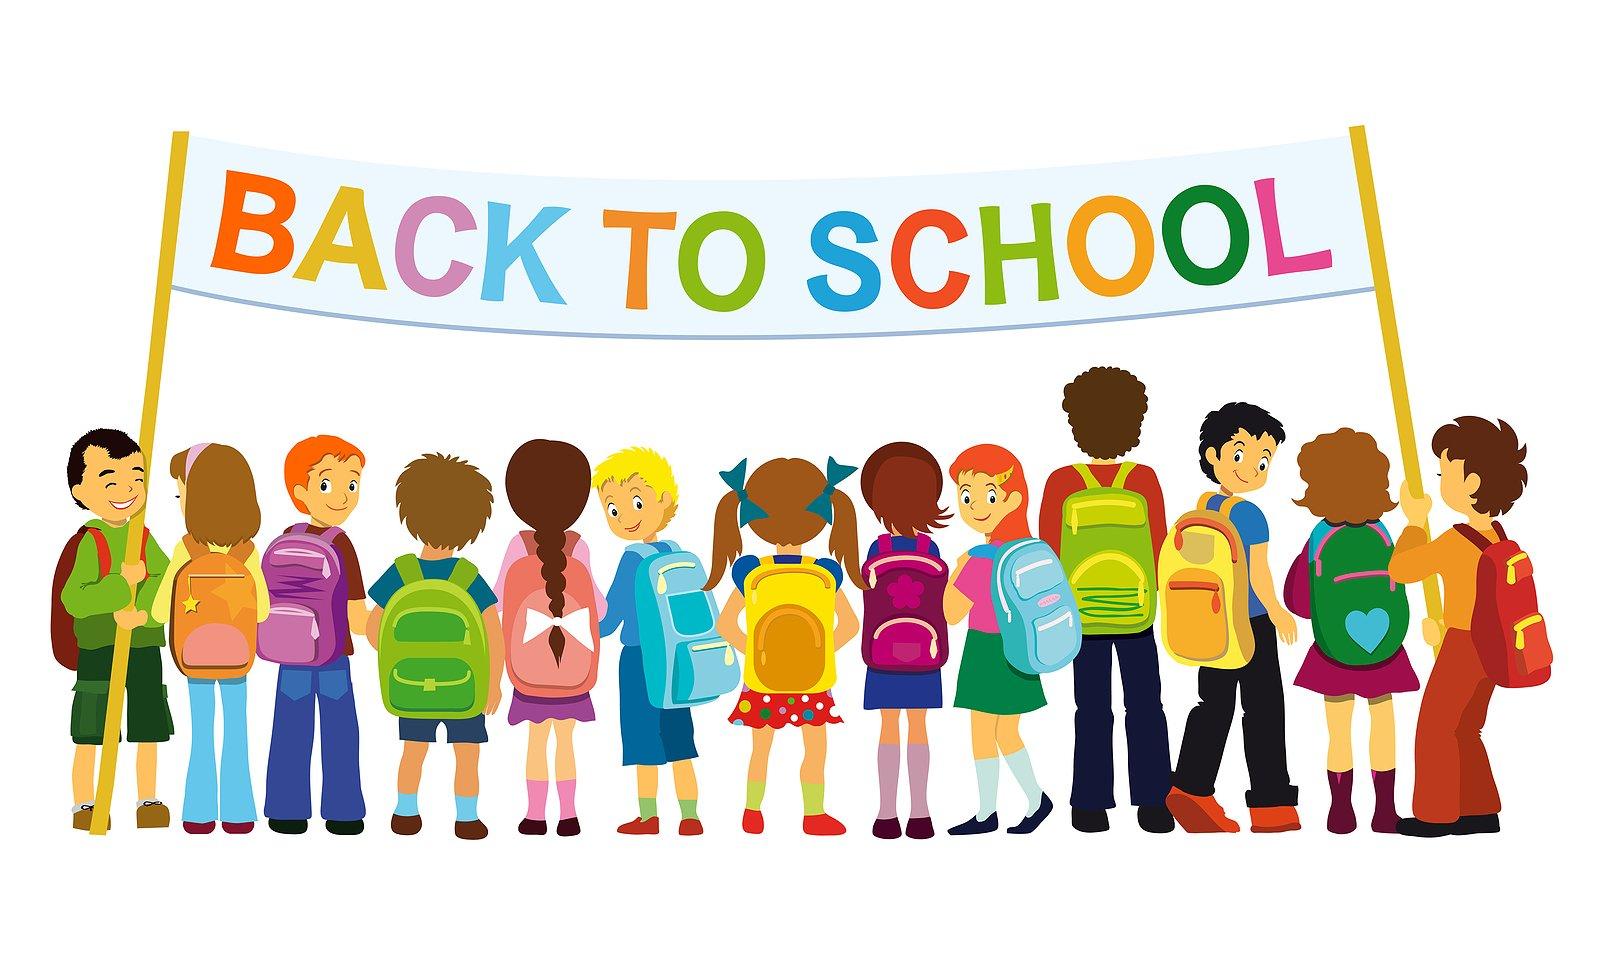 Back To School Clipart 2-Back to school clipart 2-3